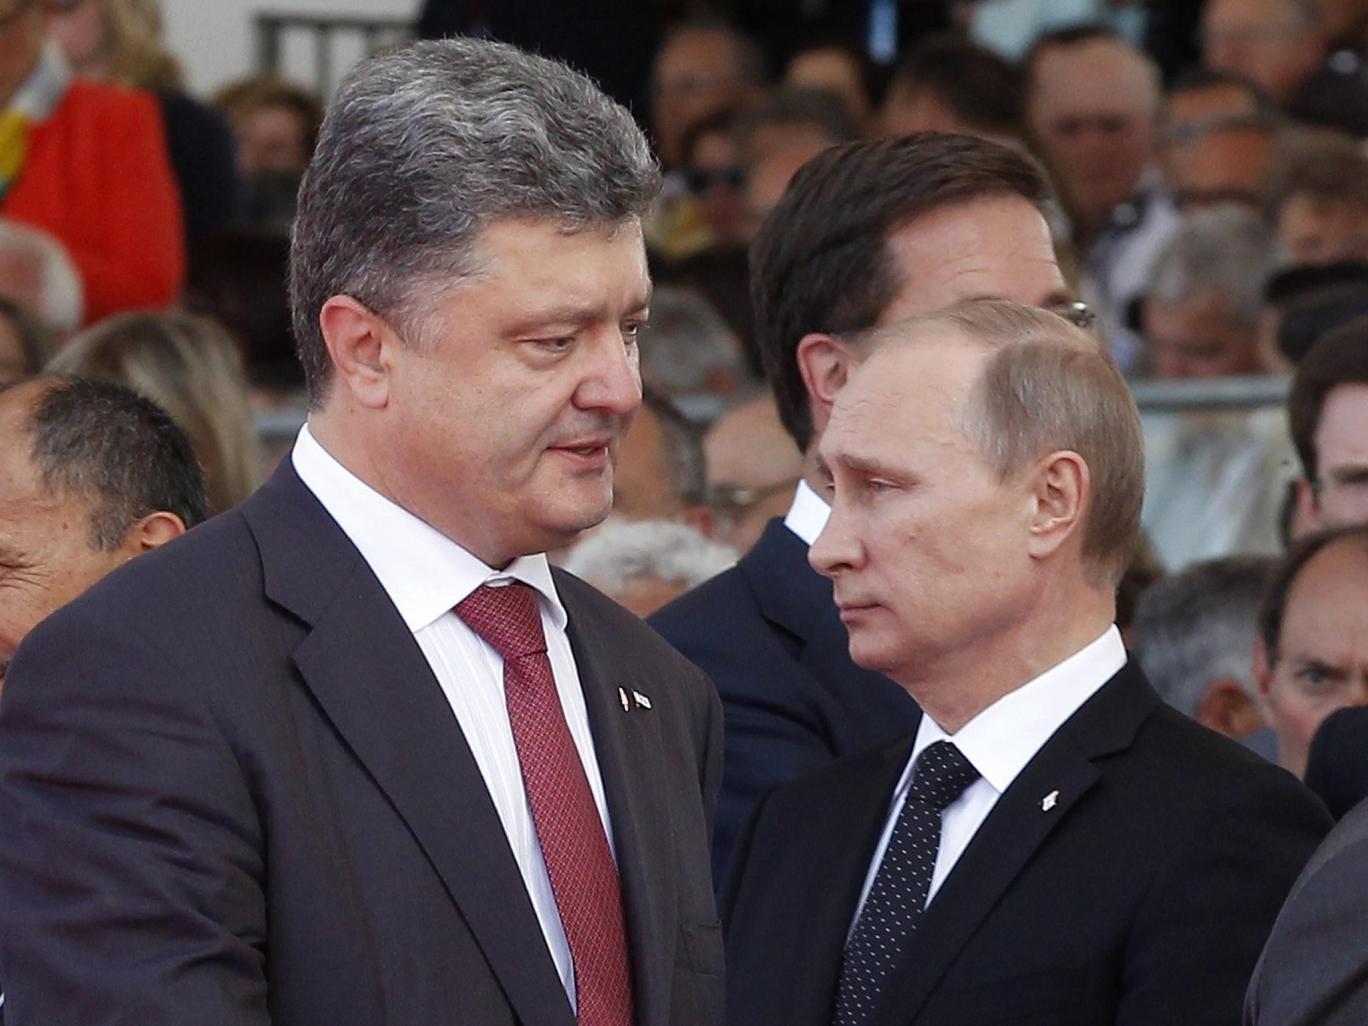 Ukraine's President-elect Petro Poroshenko (left) and Russian President Vladimir Putin